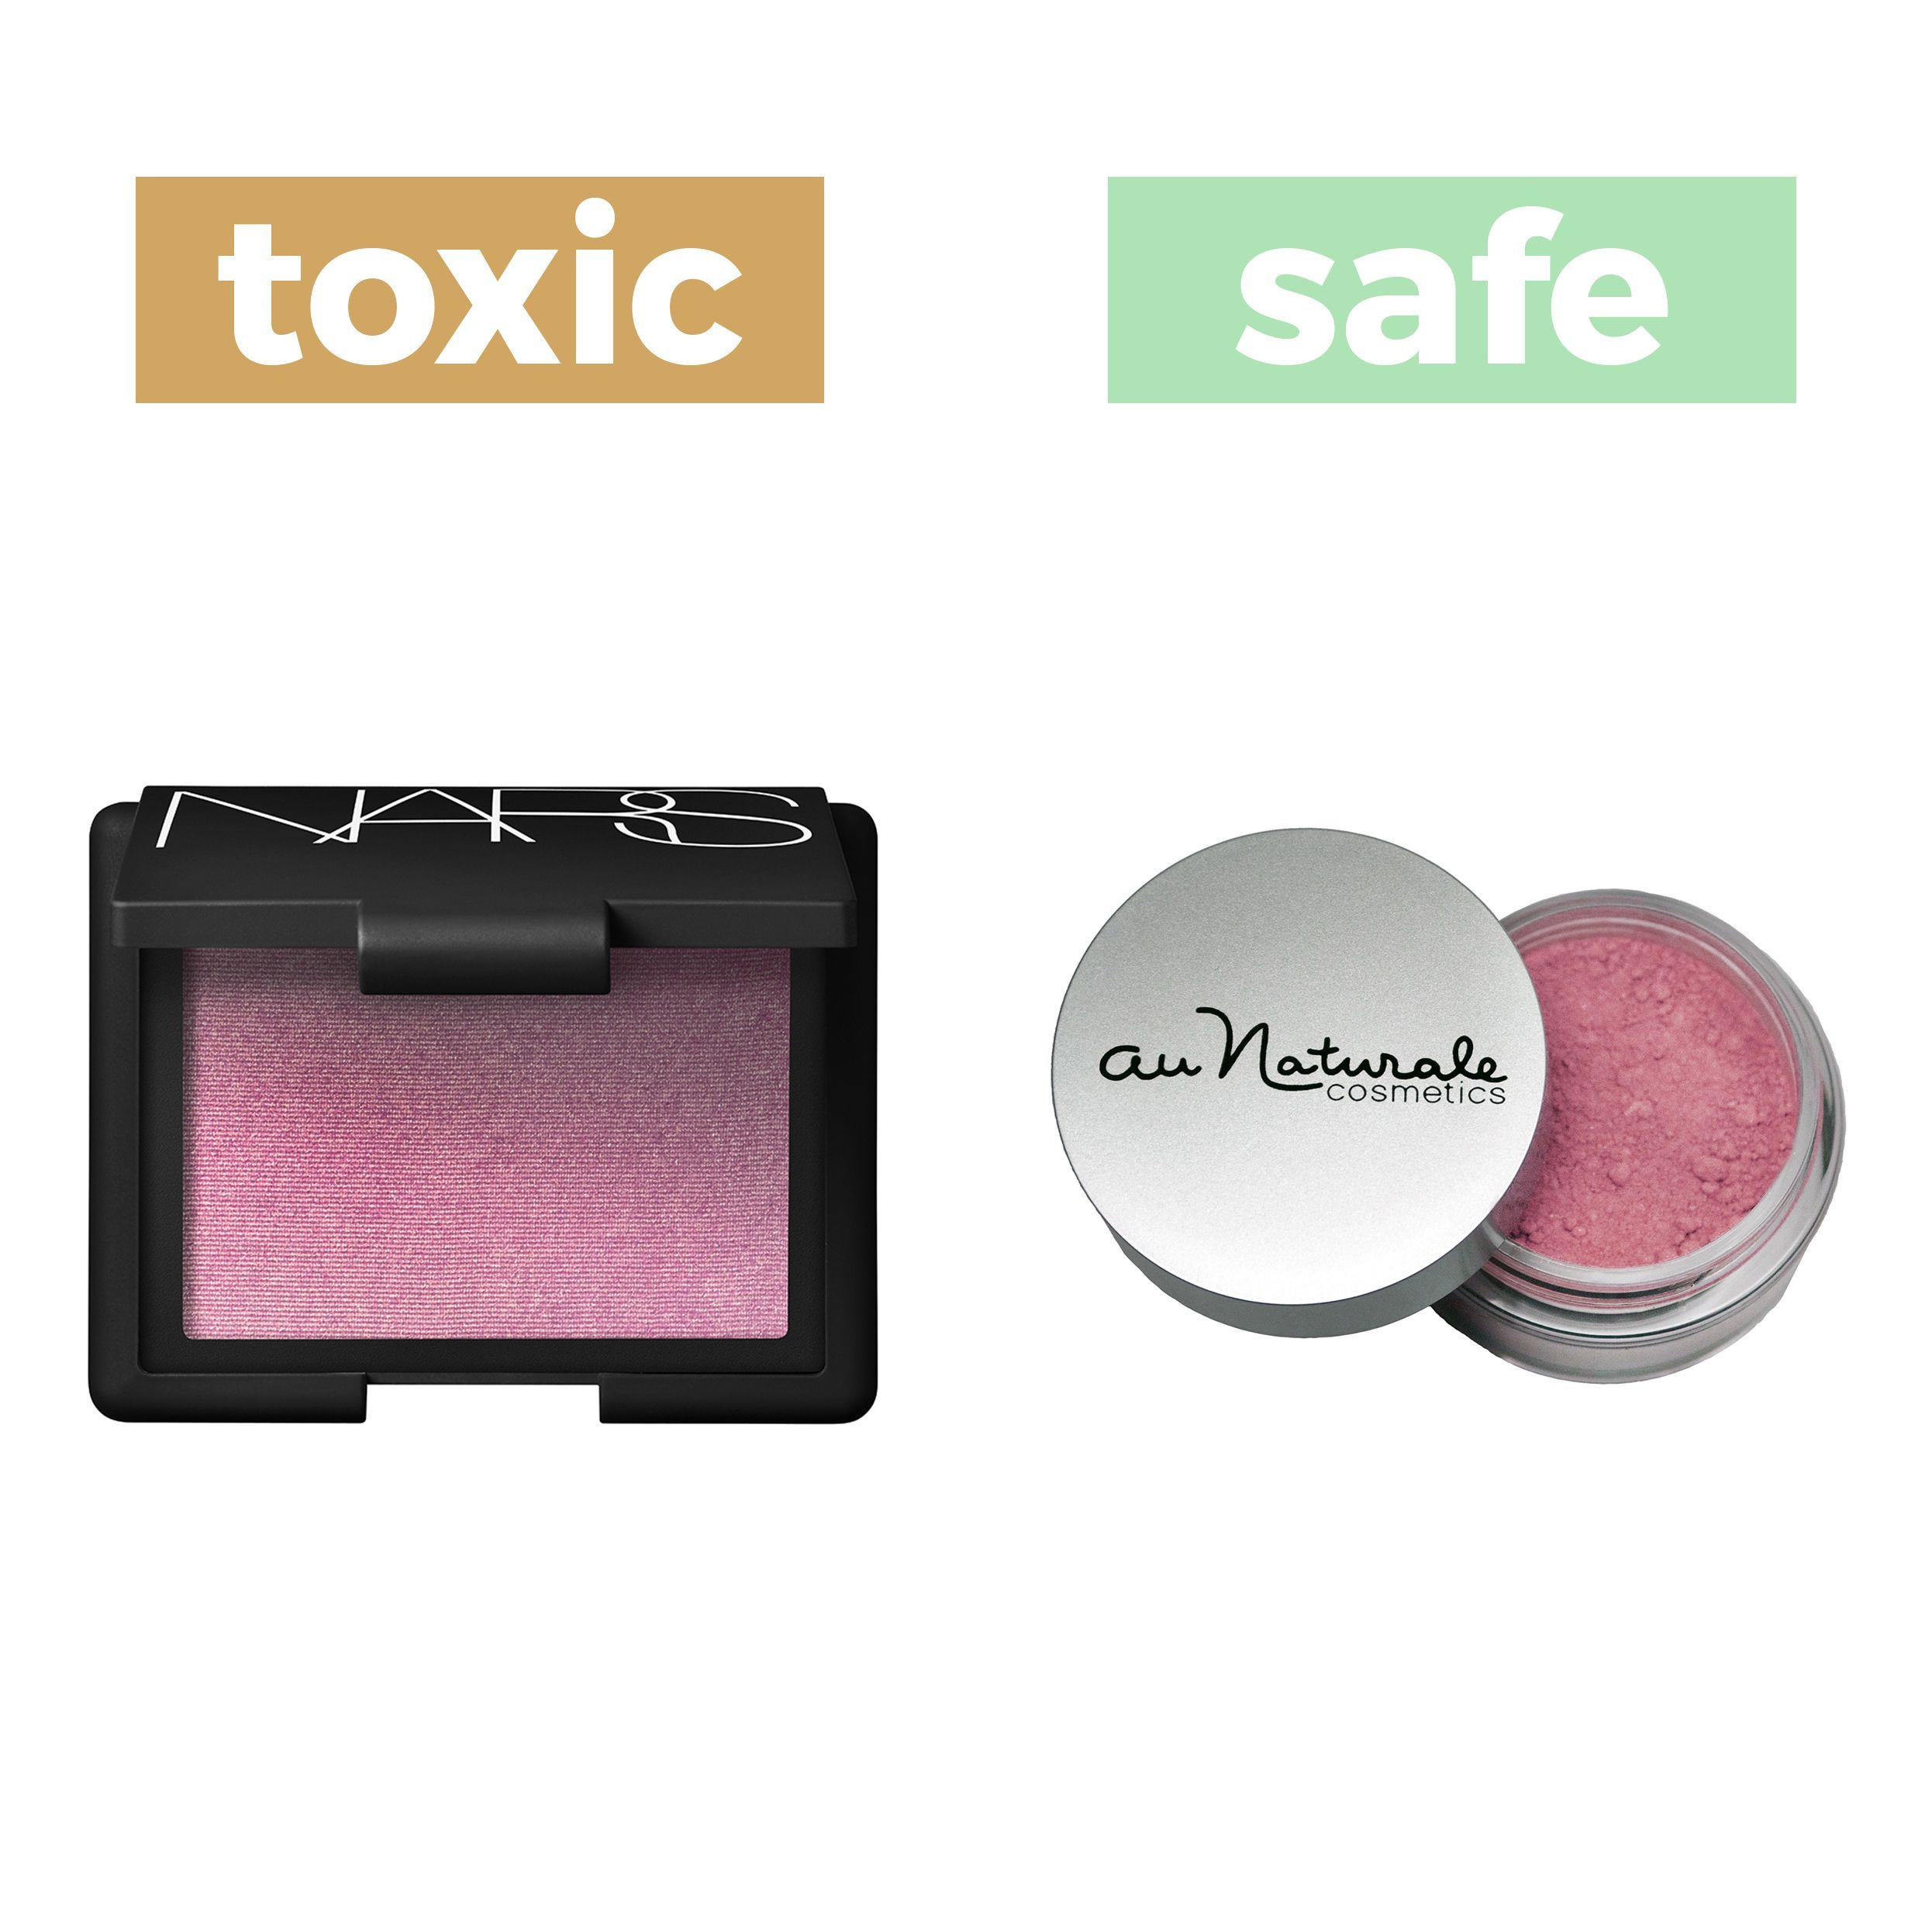 NonToxic Product & Food Swaps Blush, Sephora, Natural